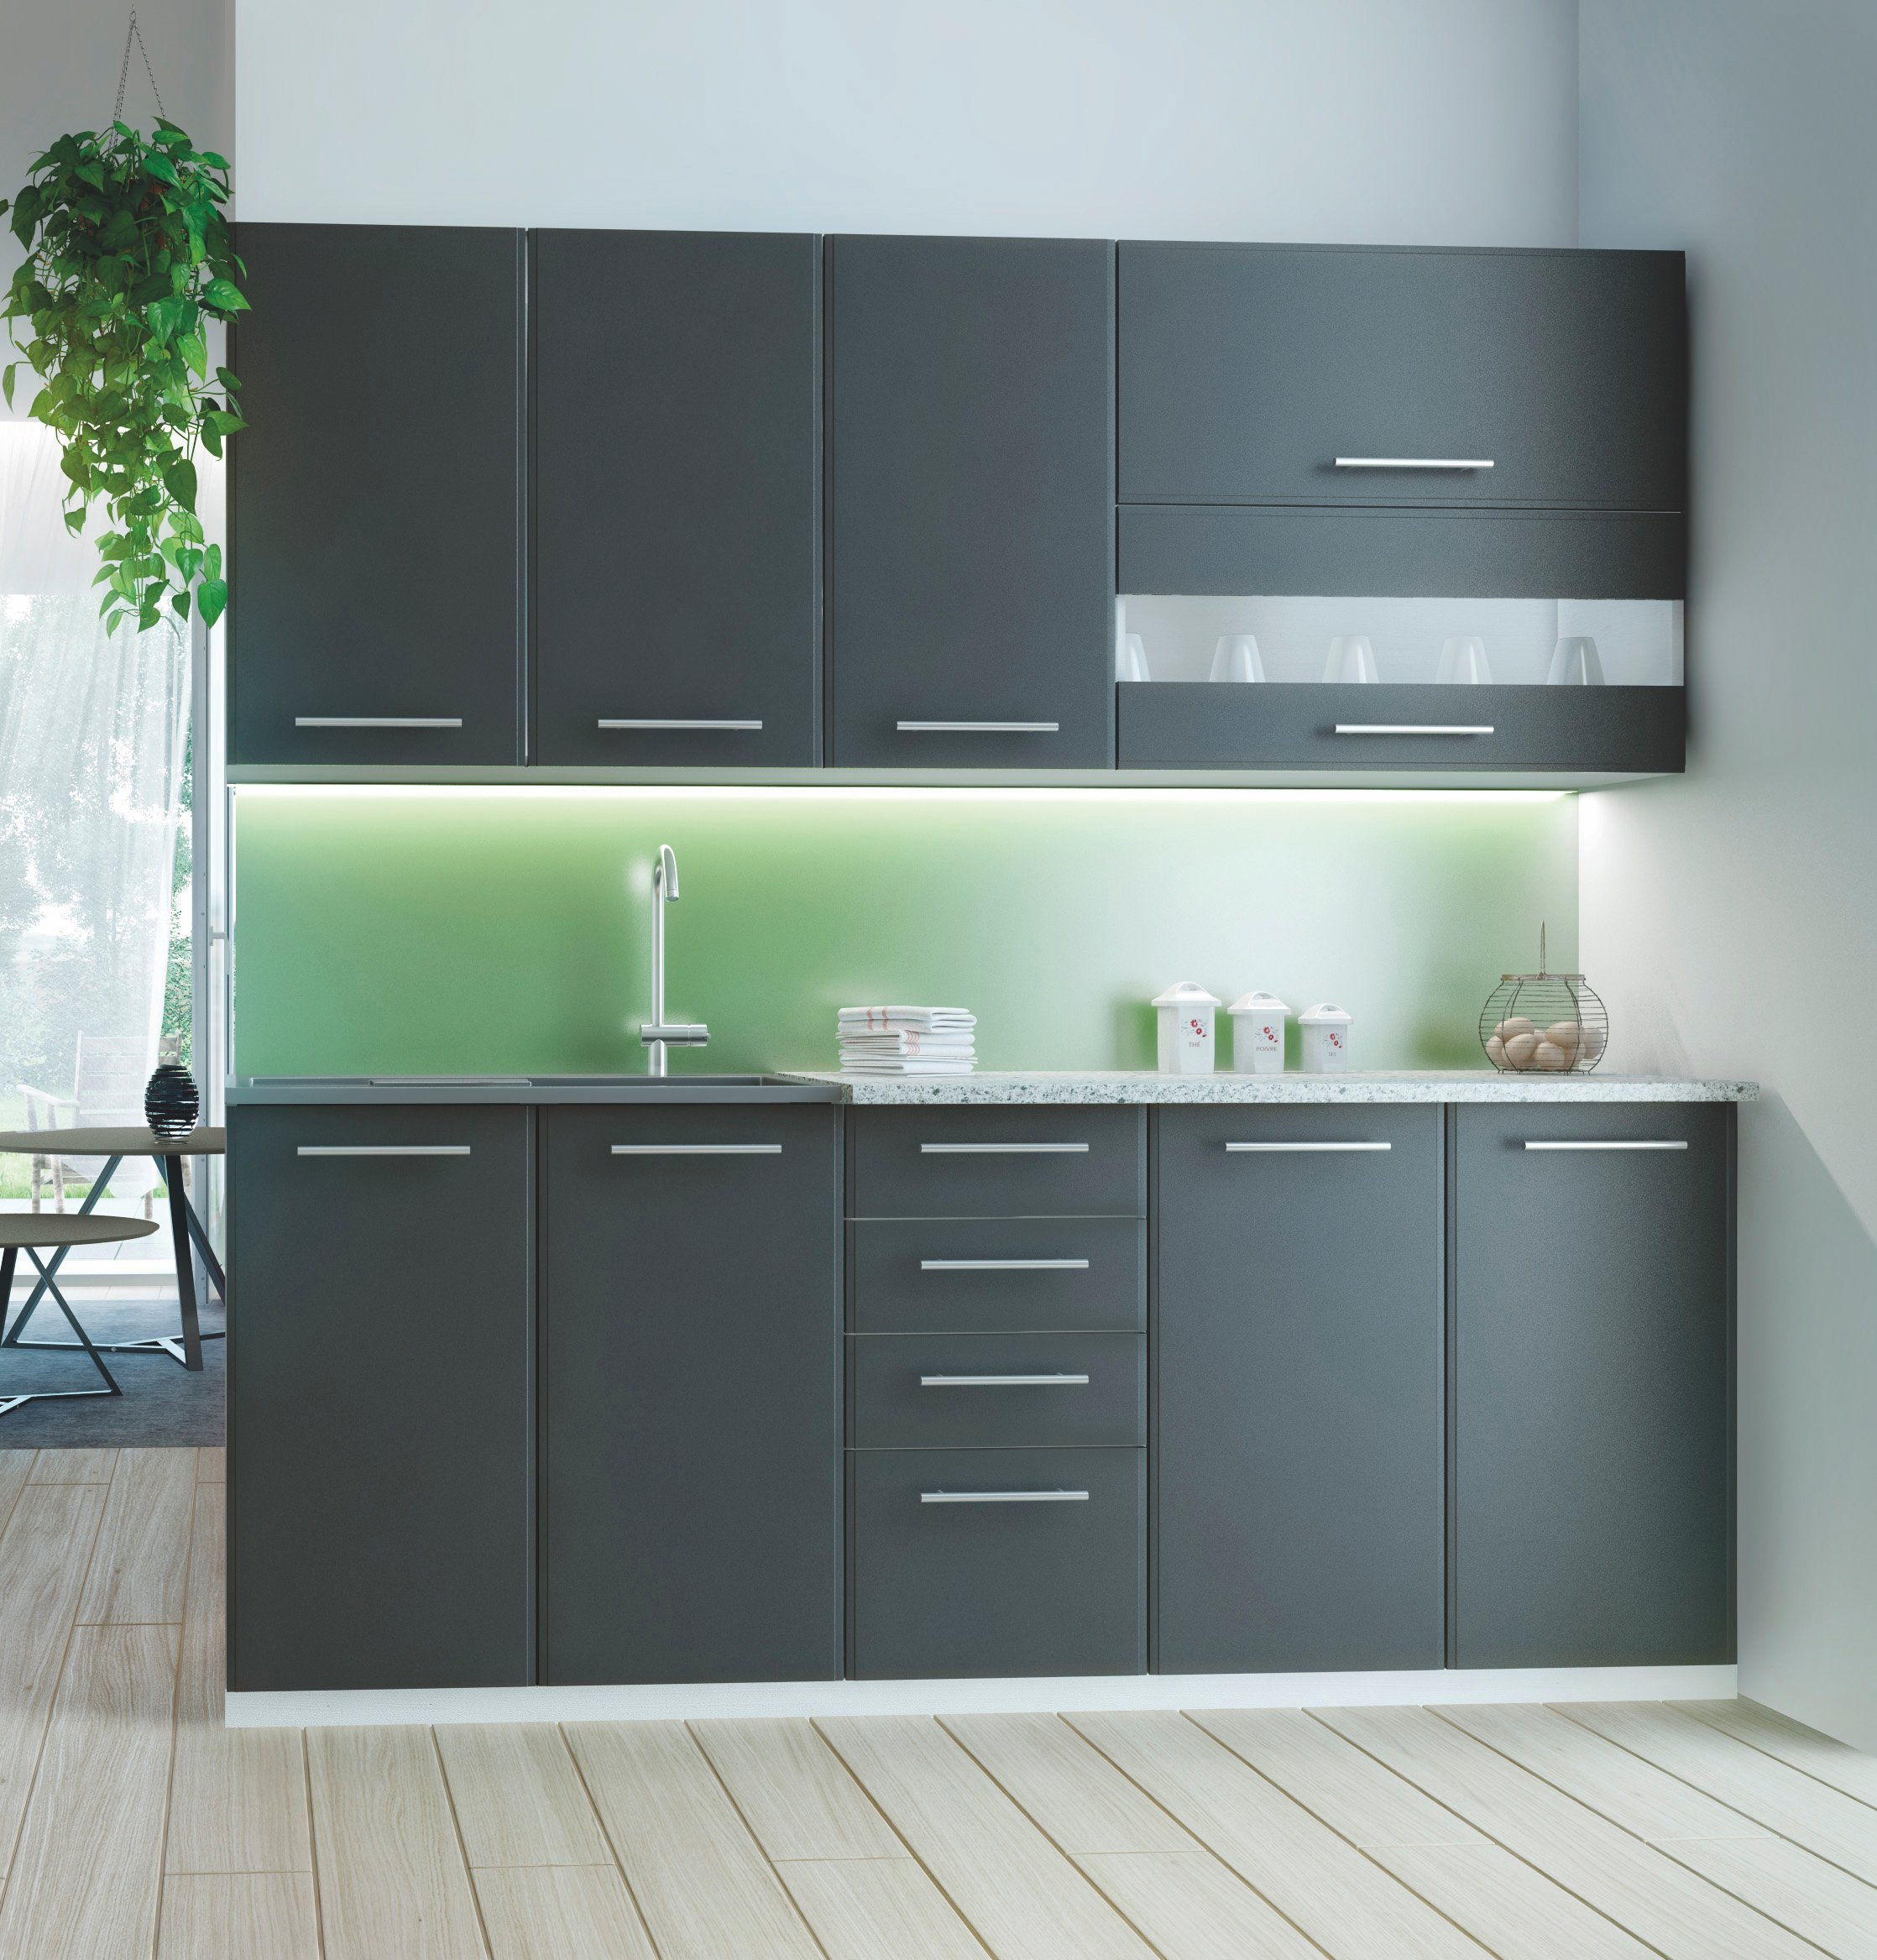 Kuchyně - Halmar - Como 200 cm